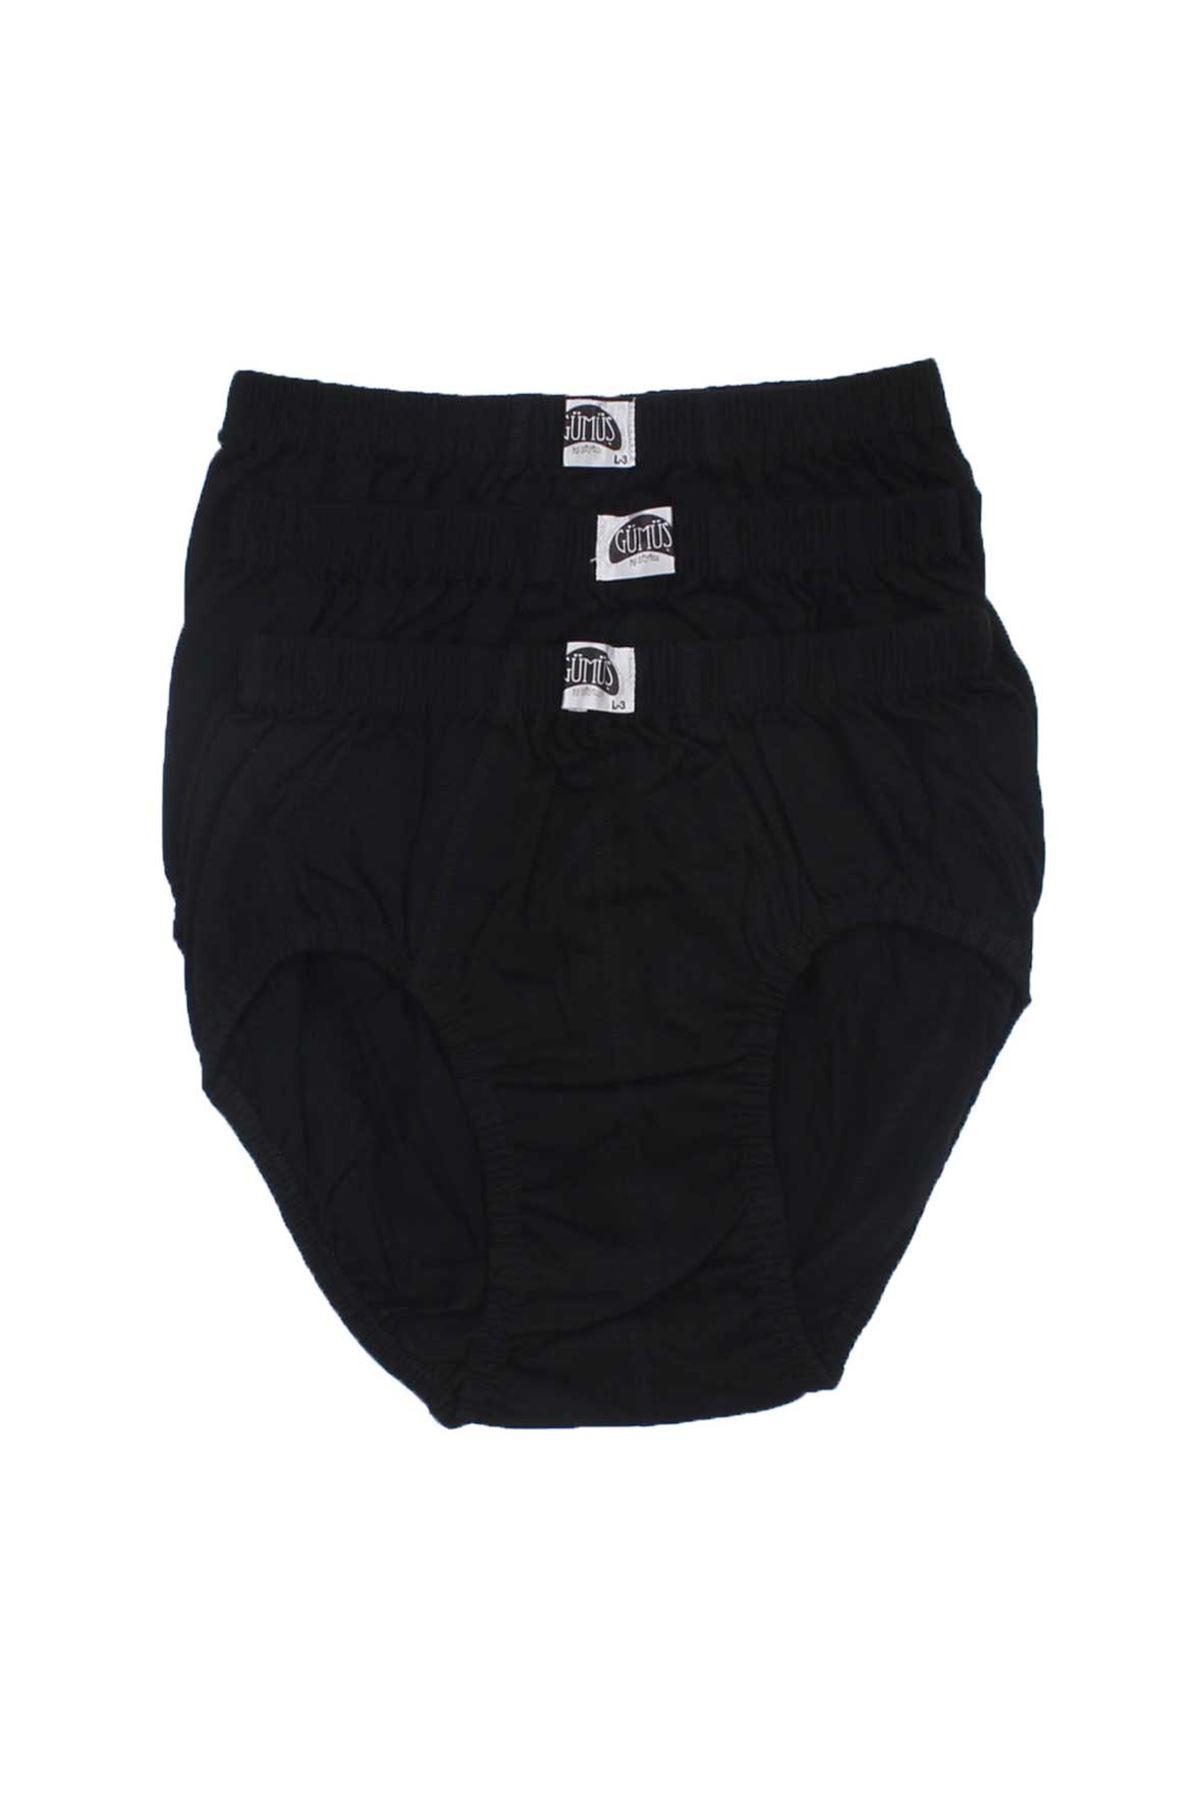 Silver Underwear Men 3 Pieces Komslip